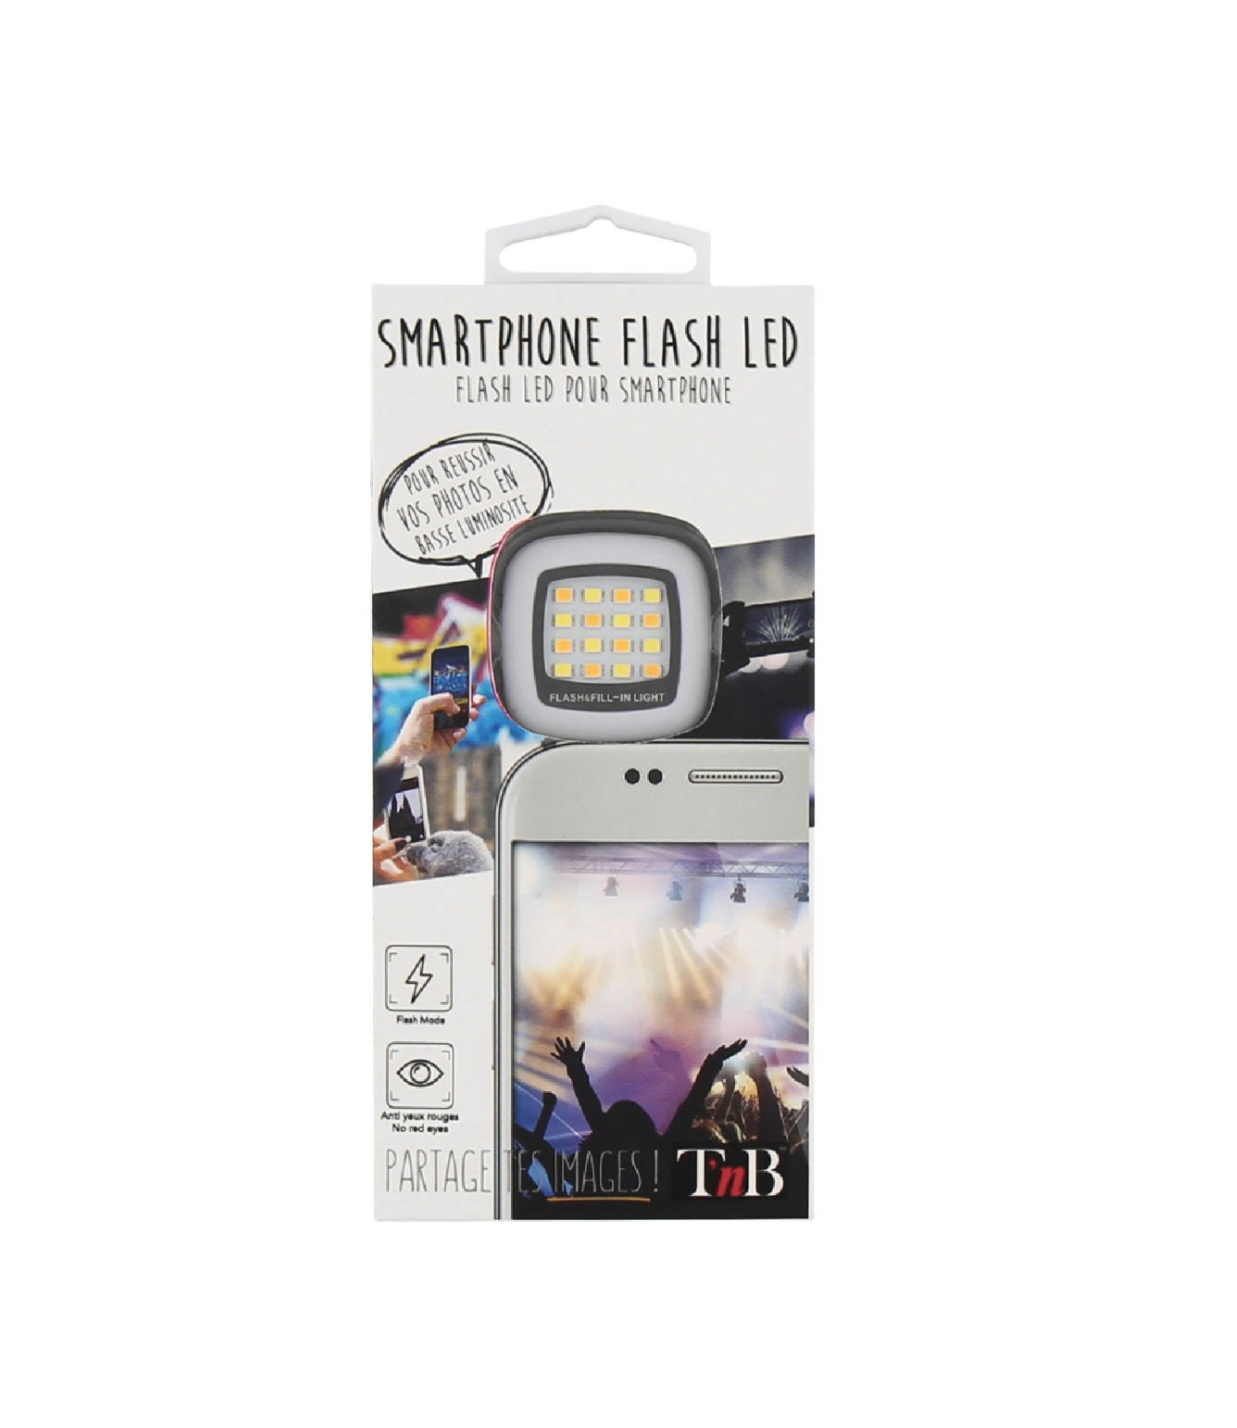 T'NB SMARTPHONE FLASH LED TELEPHONE PHONE LIGHT LUMIERE FLASH  3303170080337 COMASOUND KARTEL CSK ONLINE